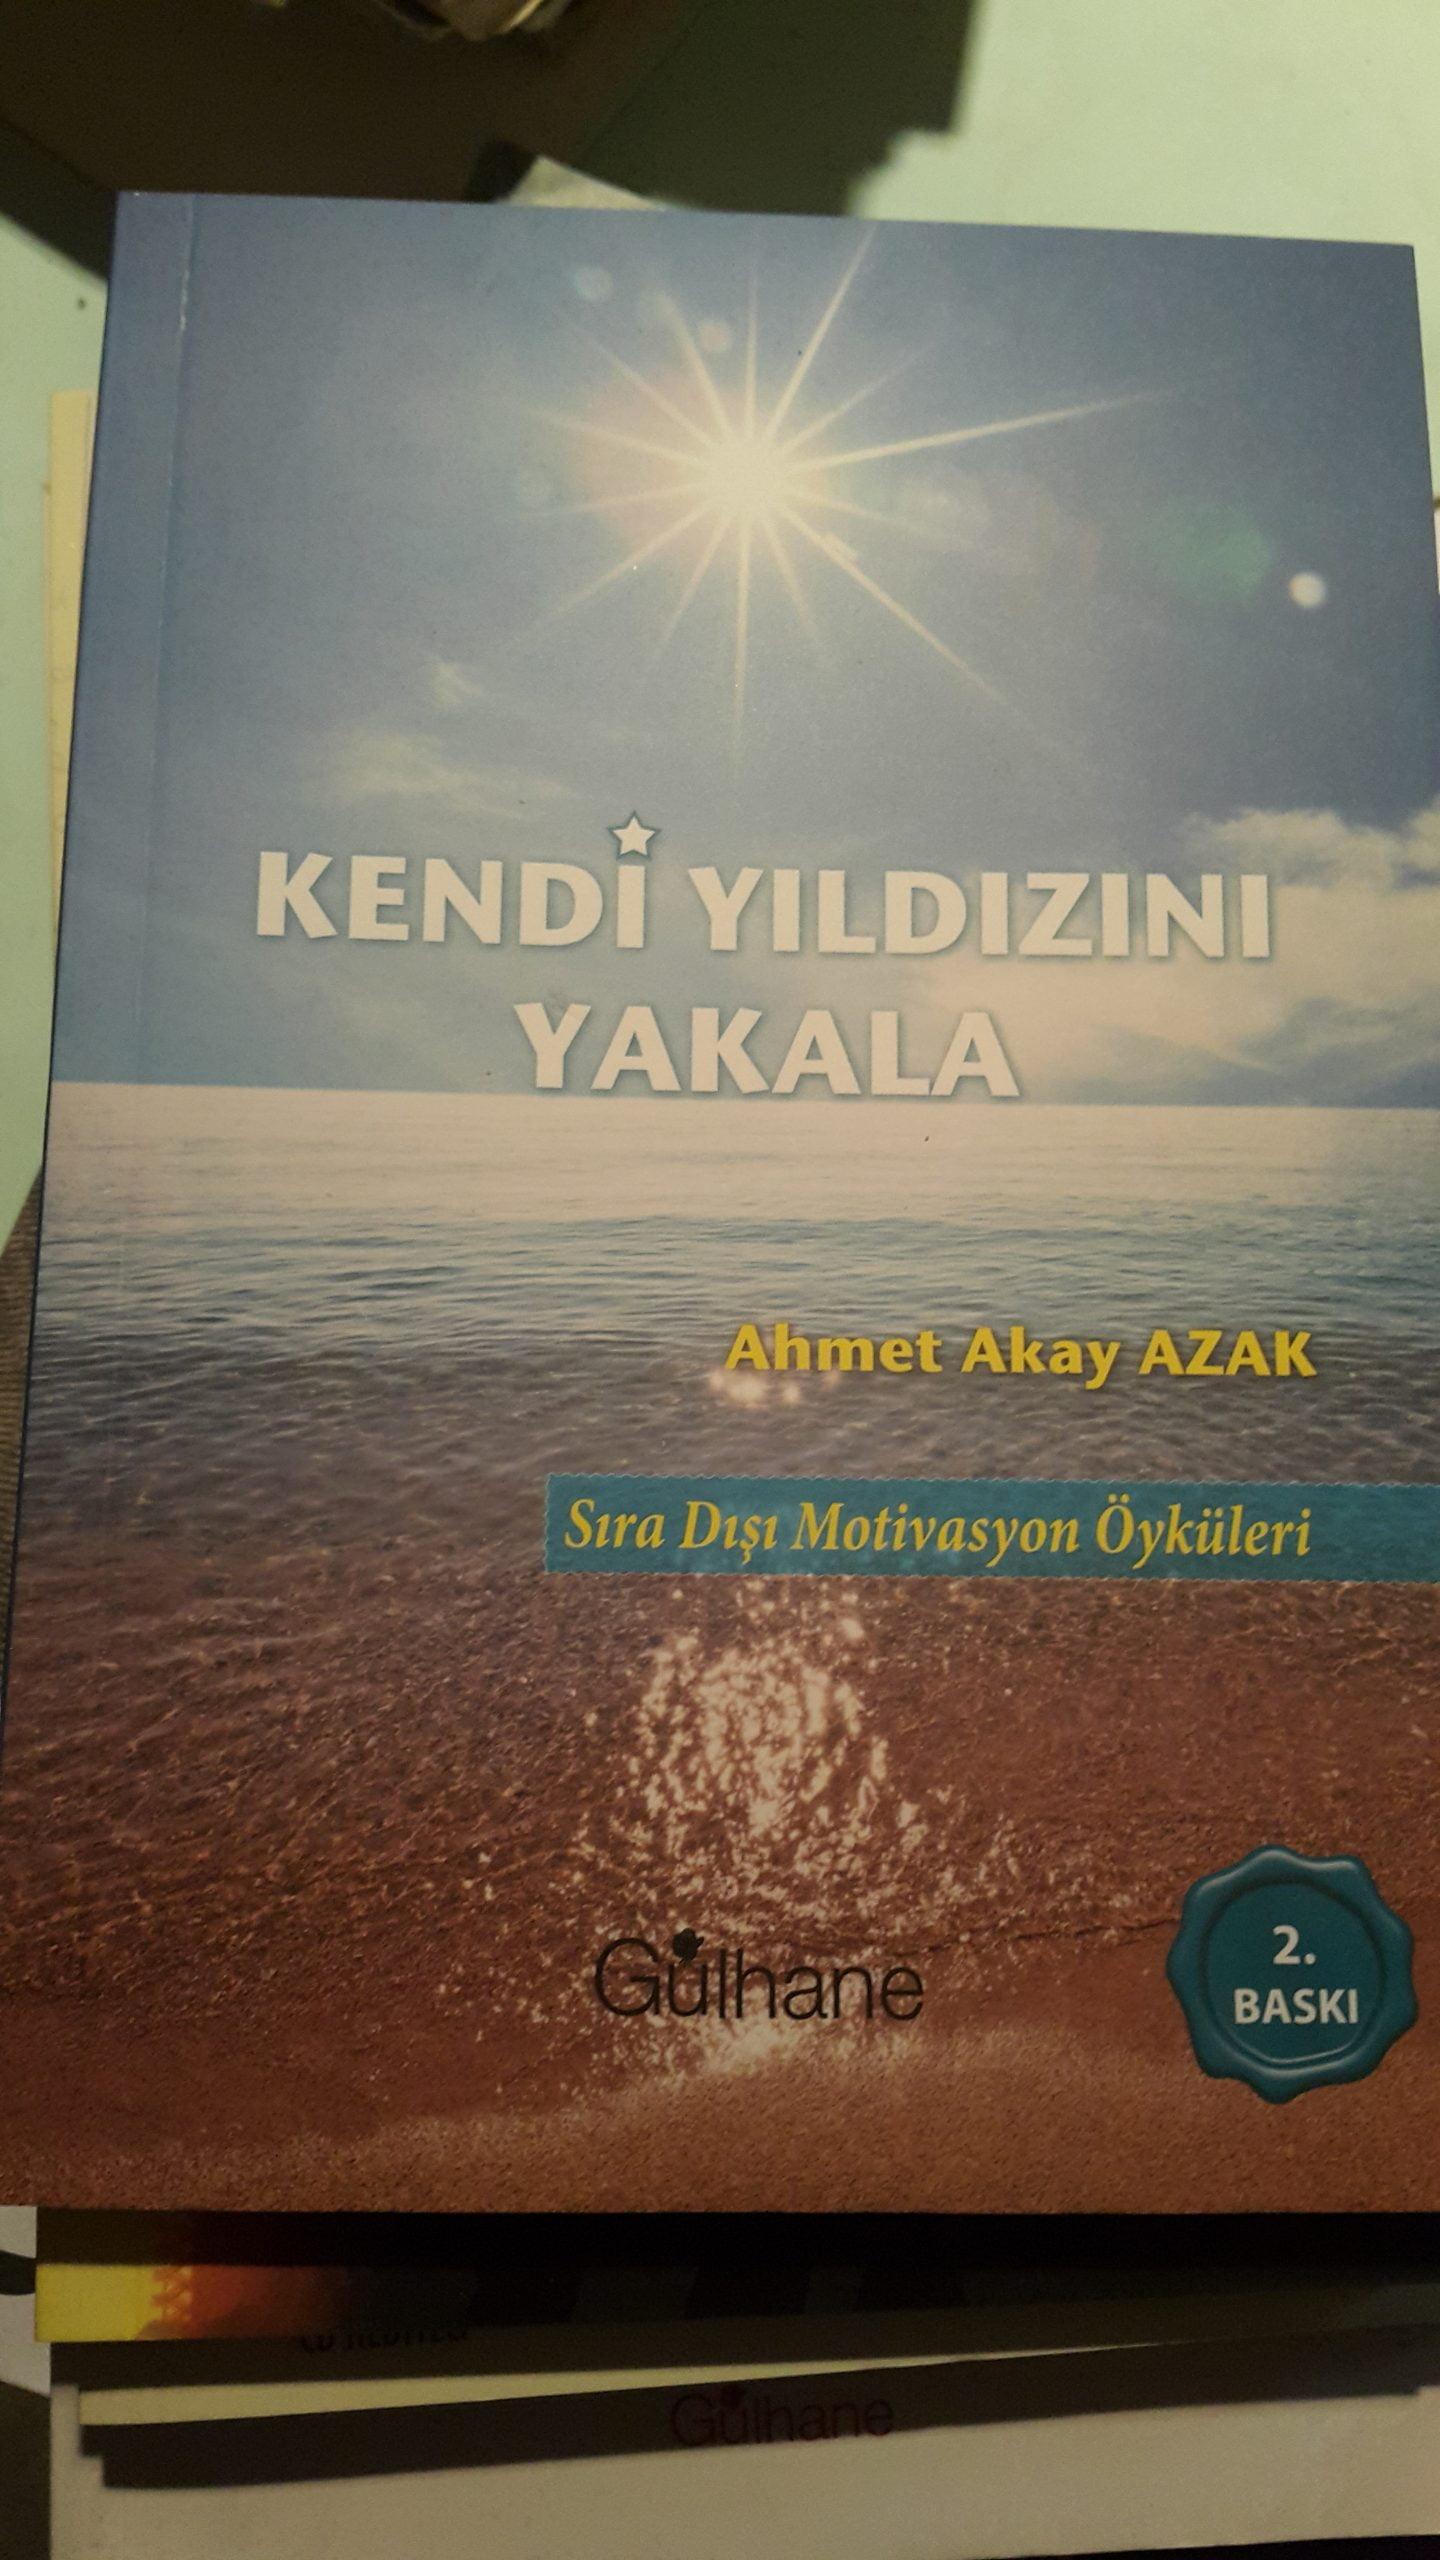 KENDİ YILDIZINI YAKALA/AHMET AKAY